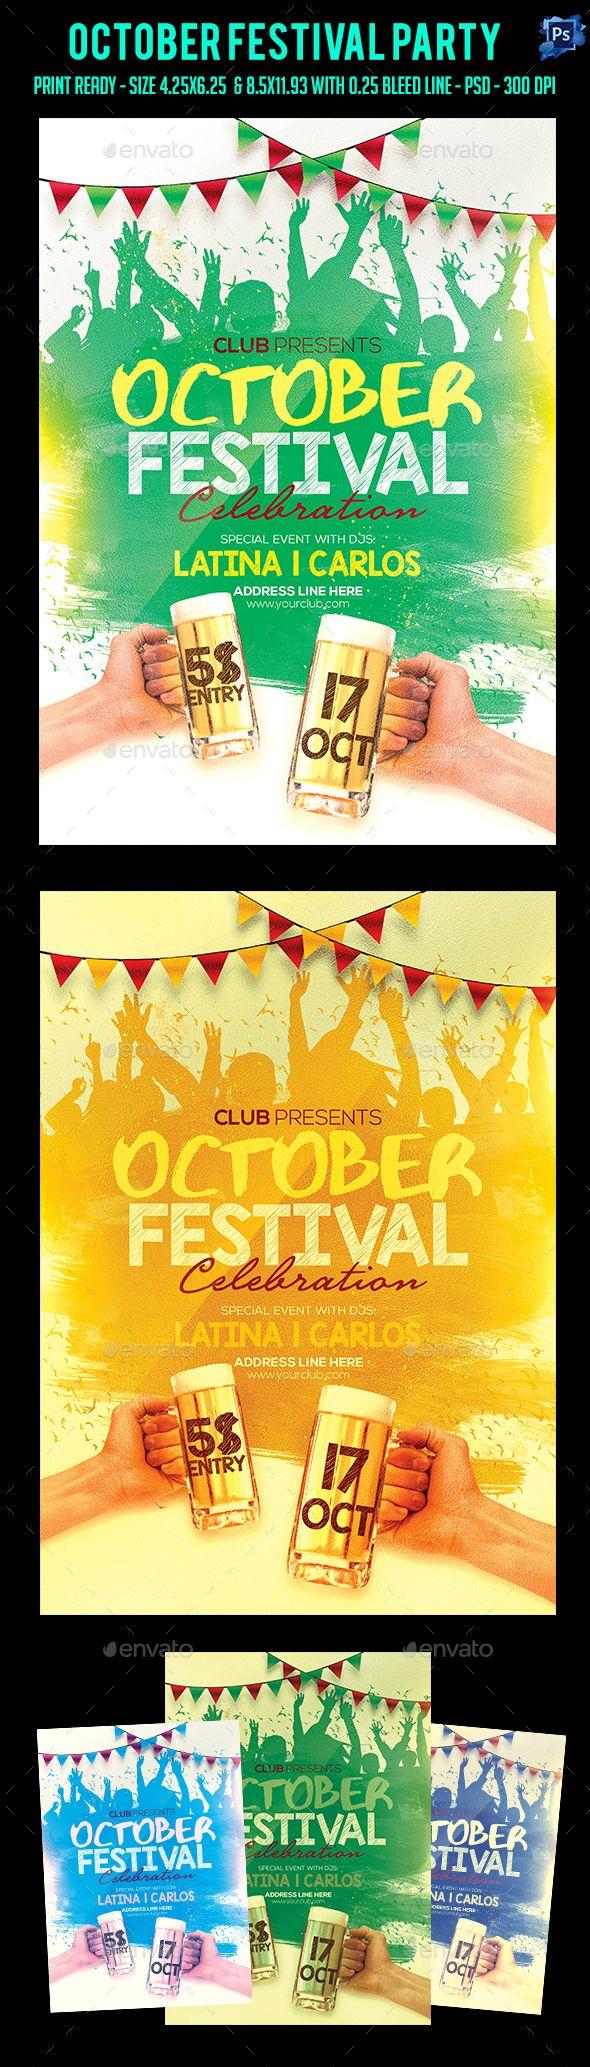 October Festival Party Flyer Template PSD. Download here: https://graphicriver.net/item/october-festival-party-flyer-/17447291?ref=ksioks